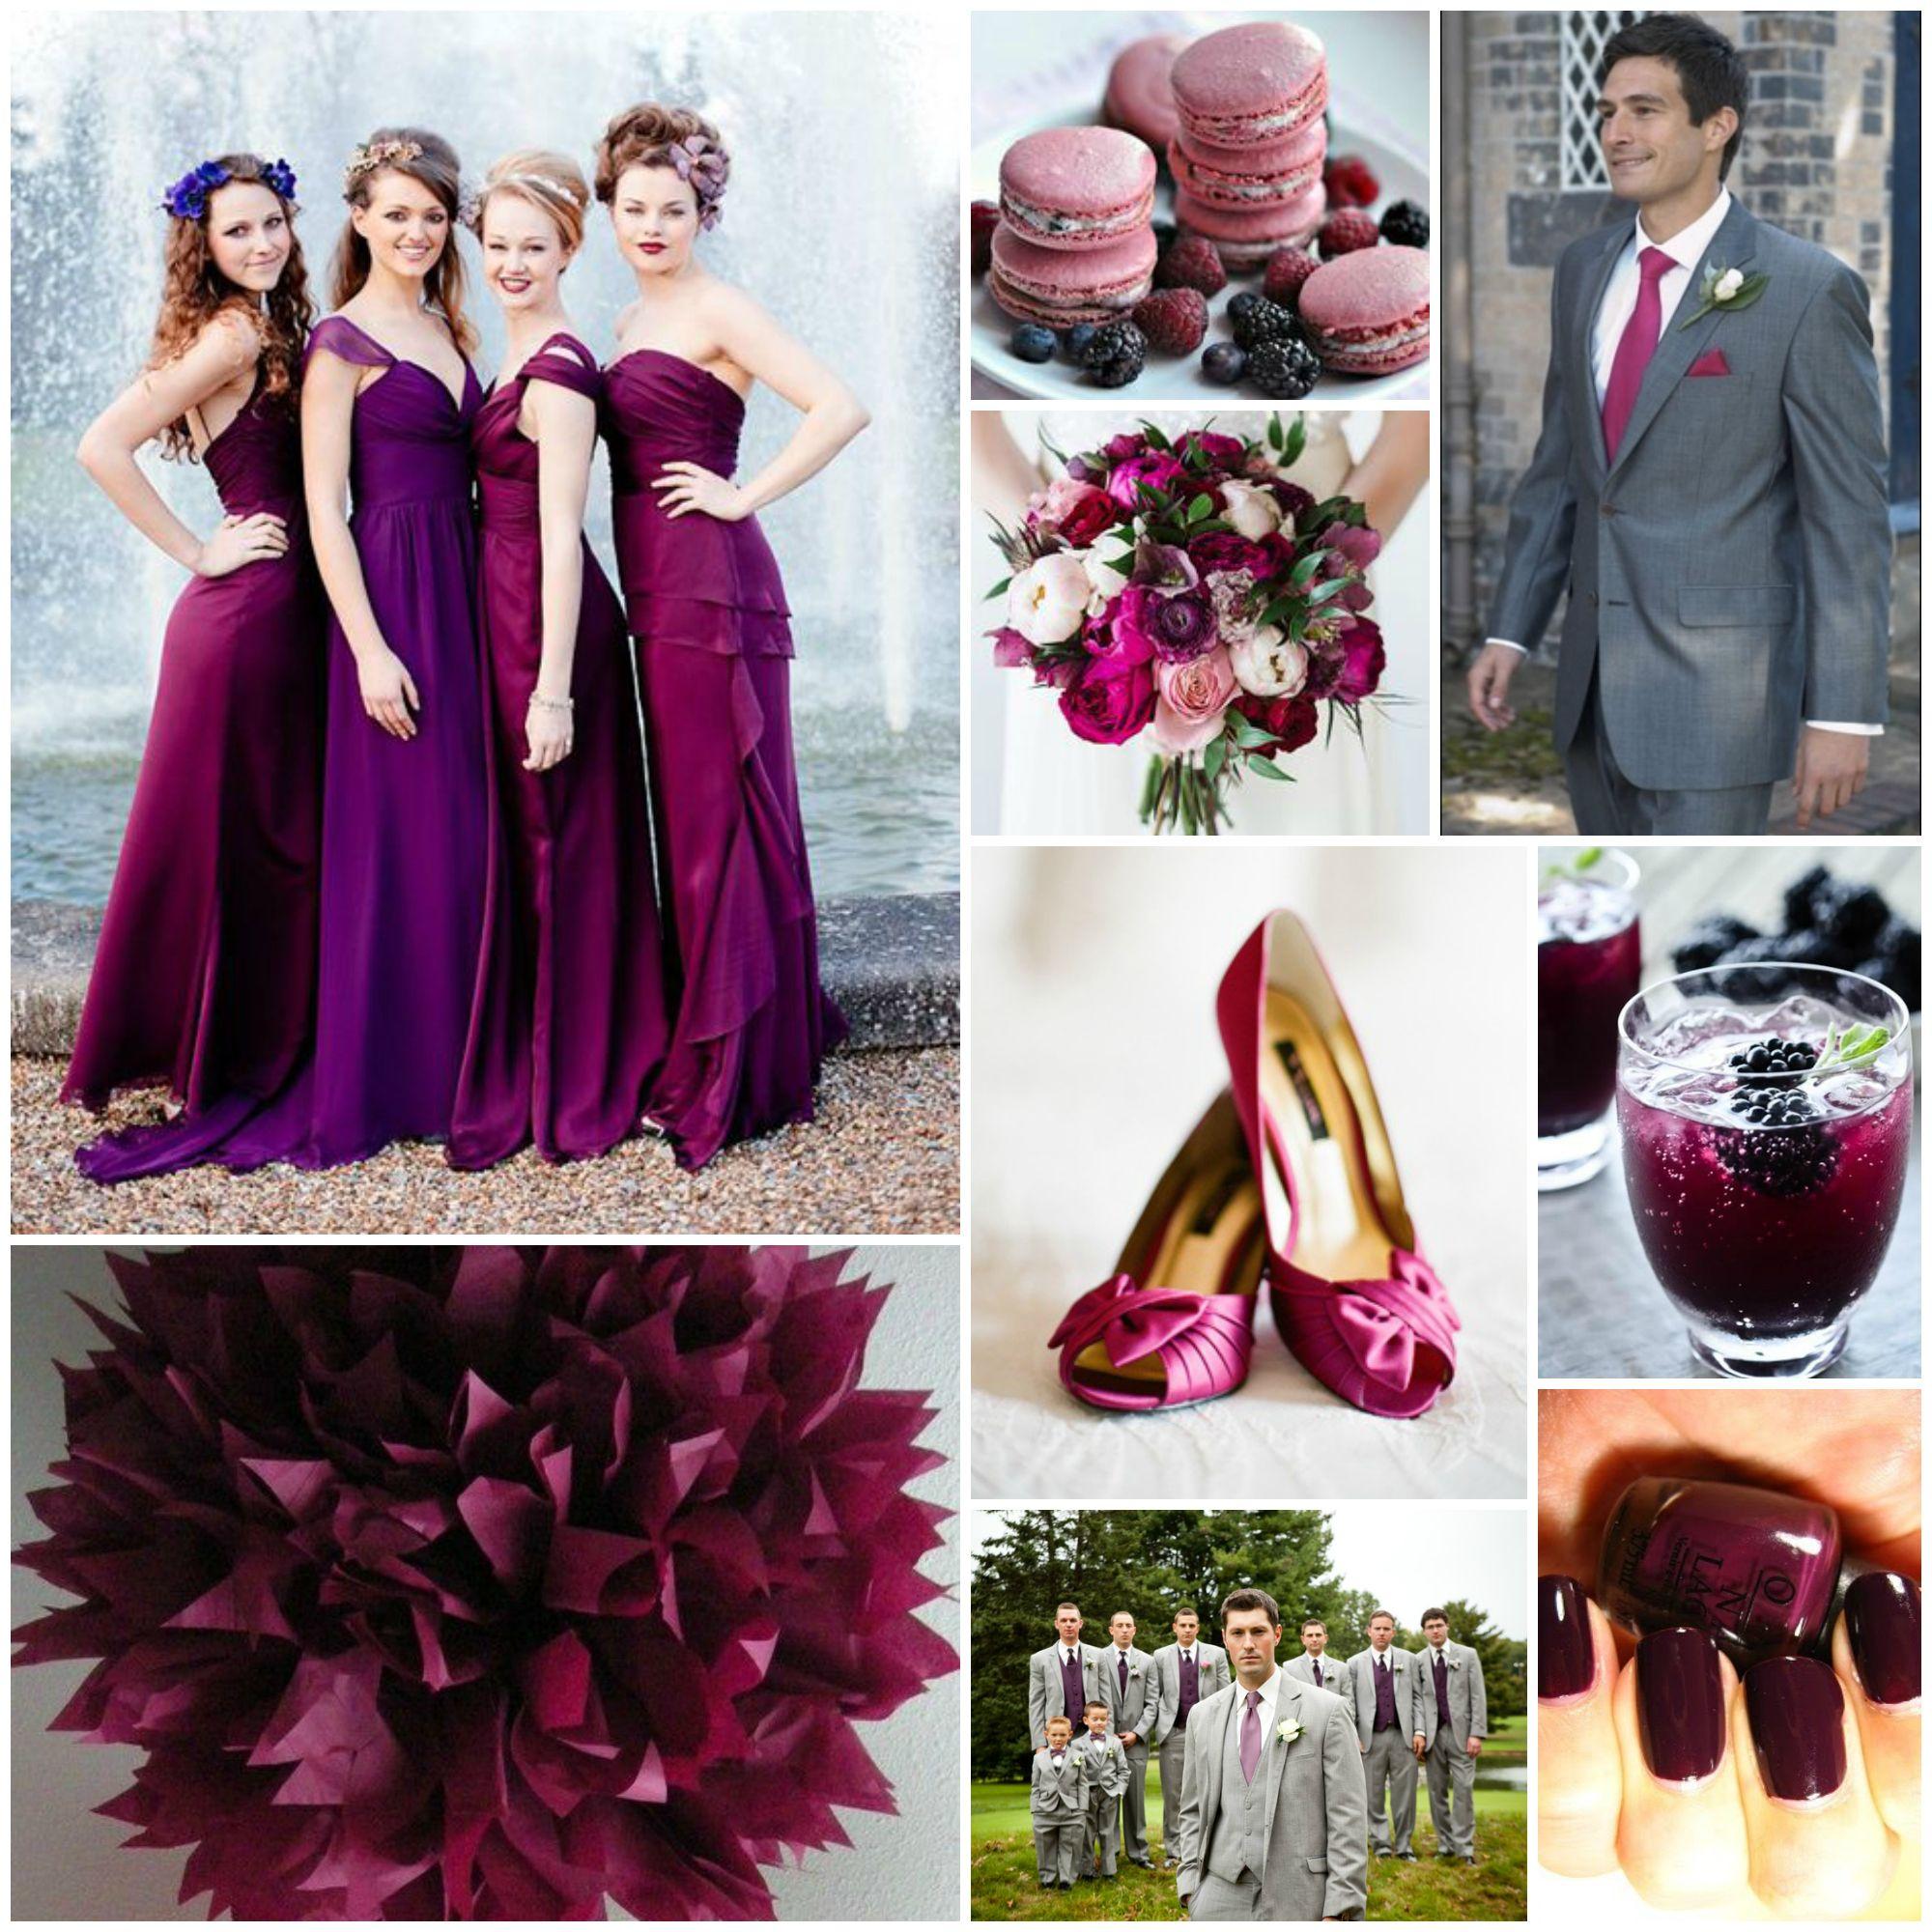 Popular Wedding Colors: Oh So Pinteresting: May's Top 10 Repins